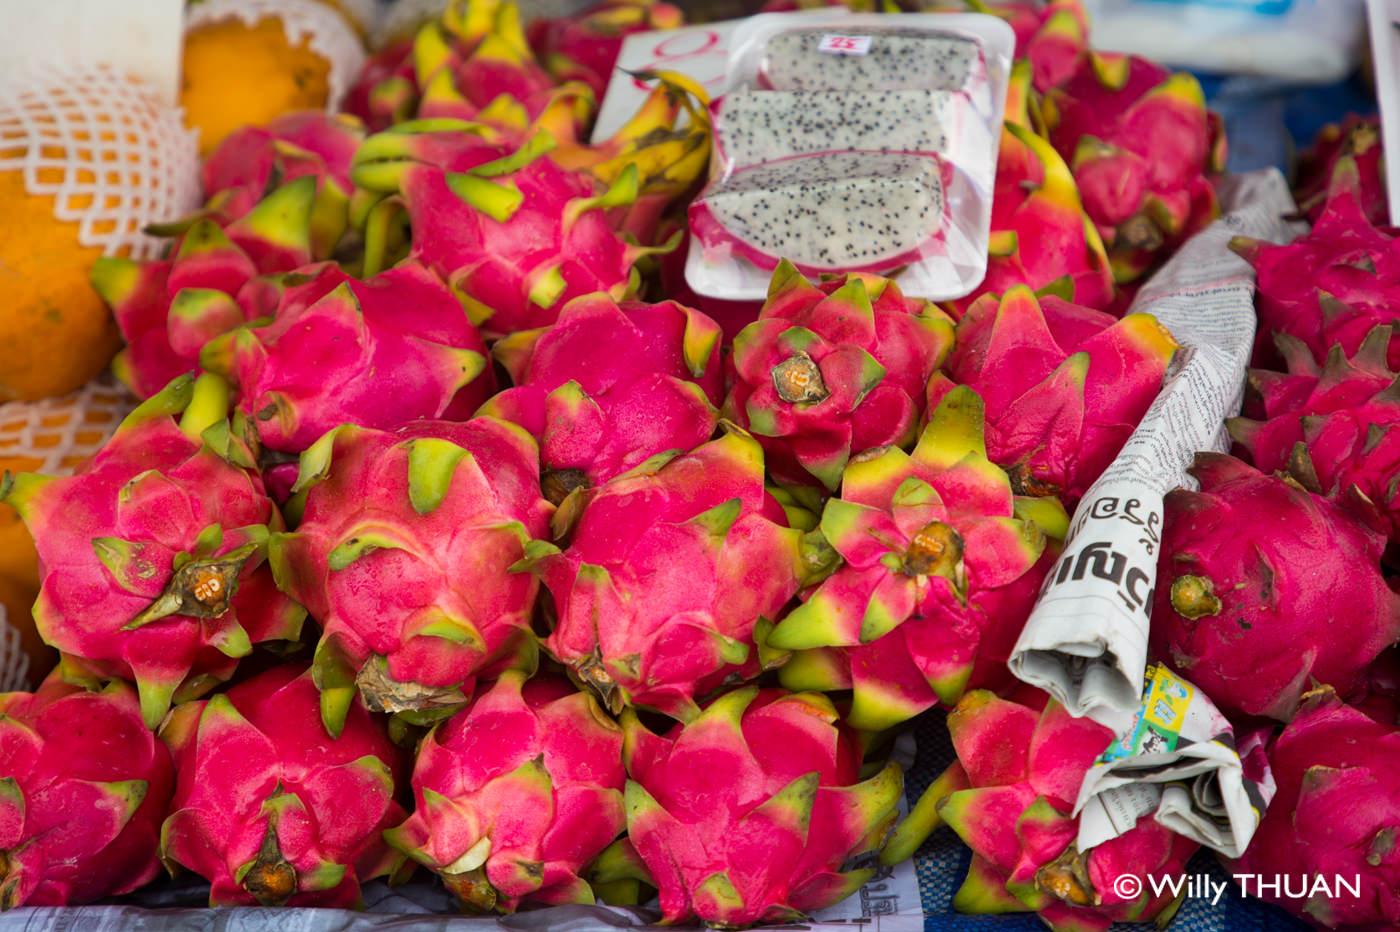 25 thai fruits to discover in phuket phuket 101